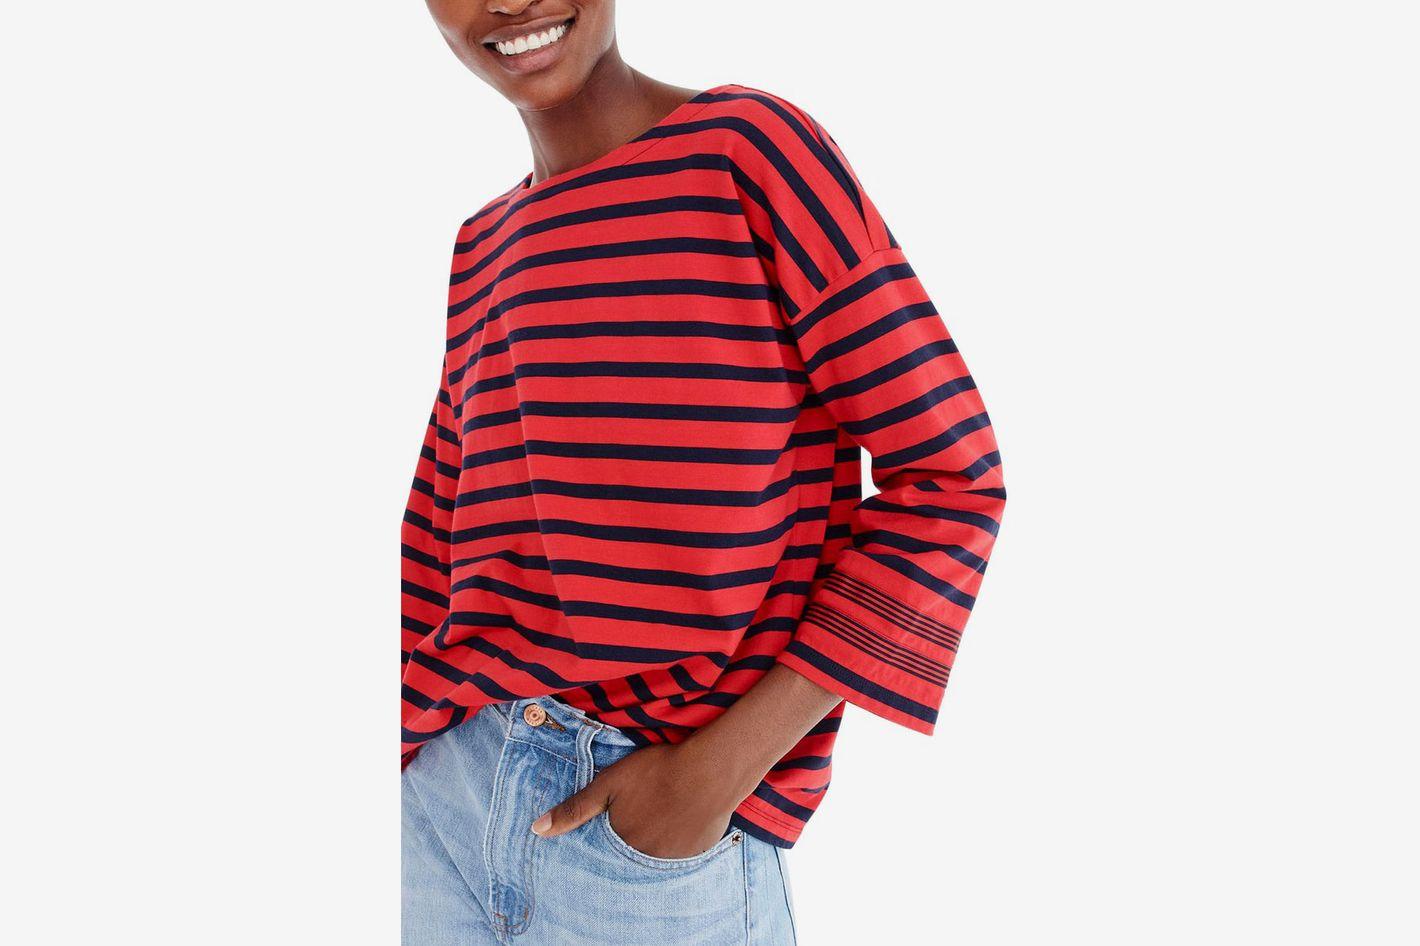 J.Crew Striped T-Shirt with Grosgrain Trim